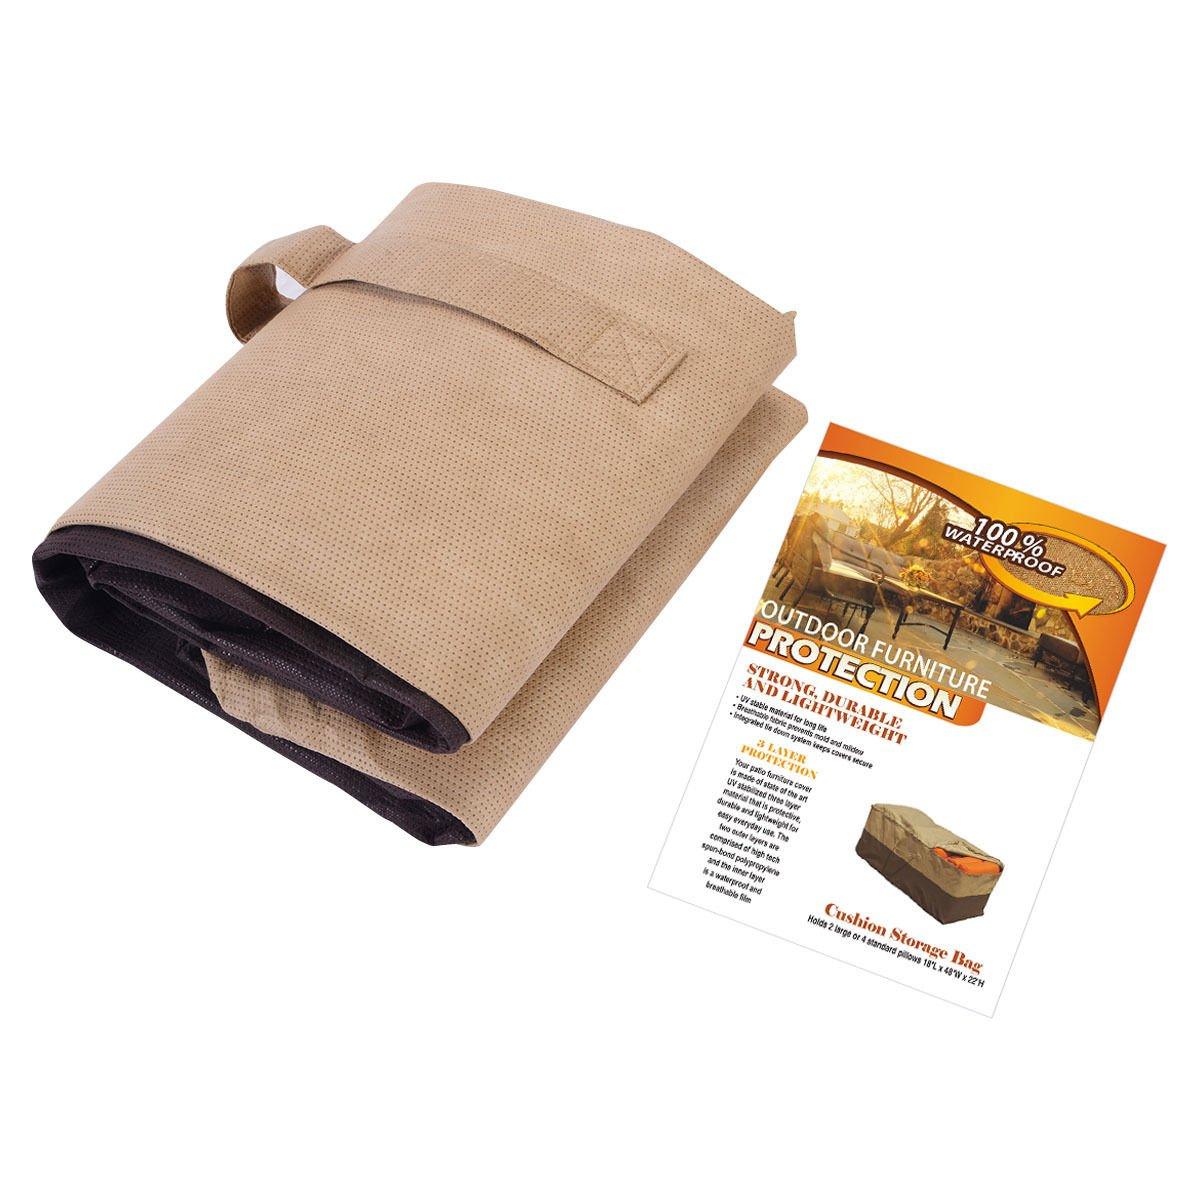 Amazon.com : New Outdoor Cushion Storage Bag Patio Furniture Chaise  Organizer Protector Cover : Garden U0026 Outdoor